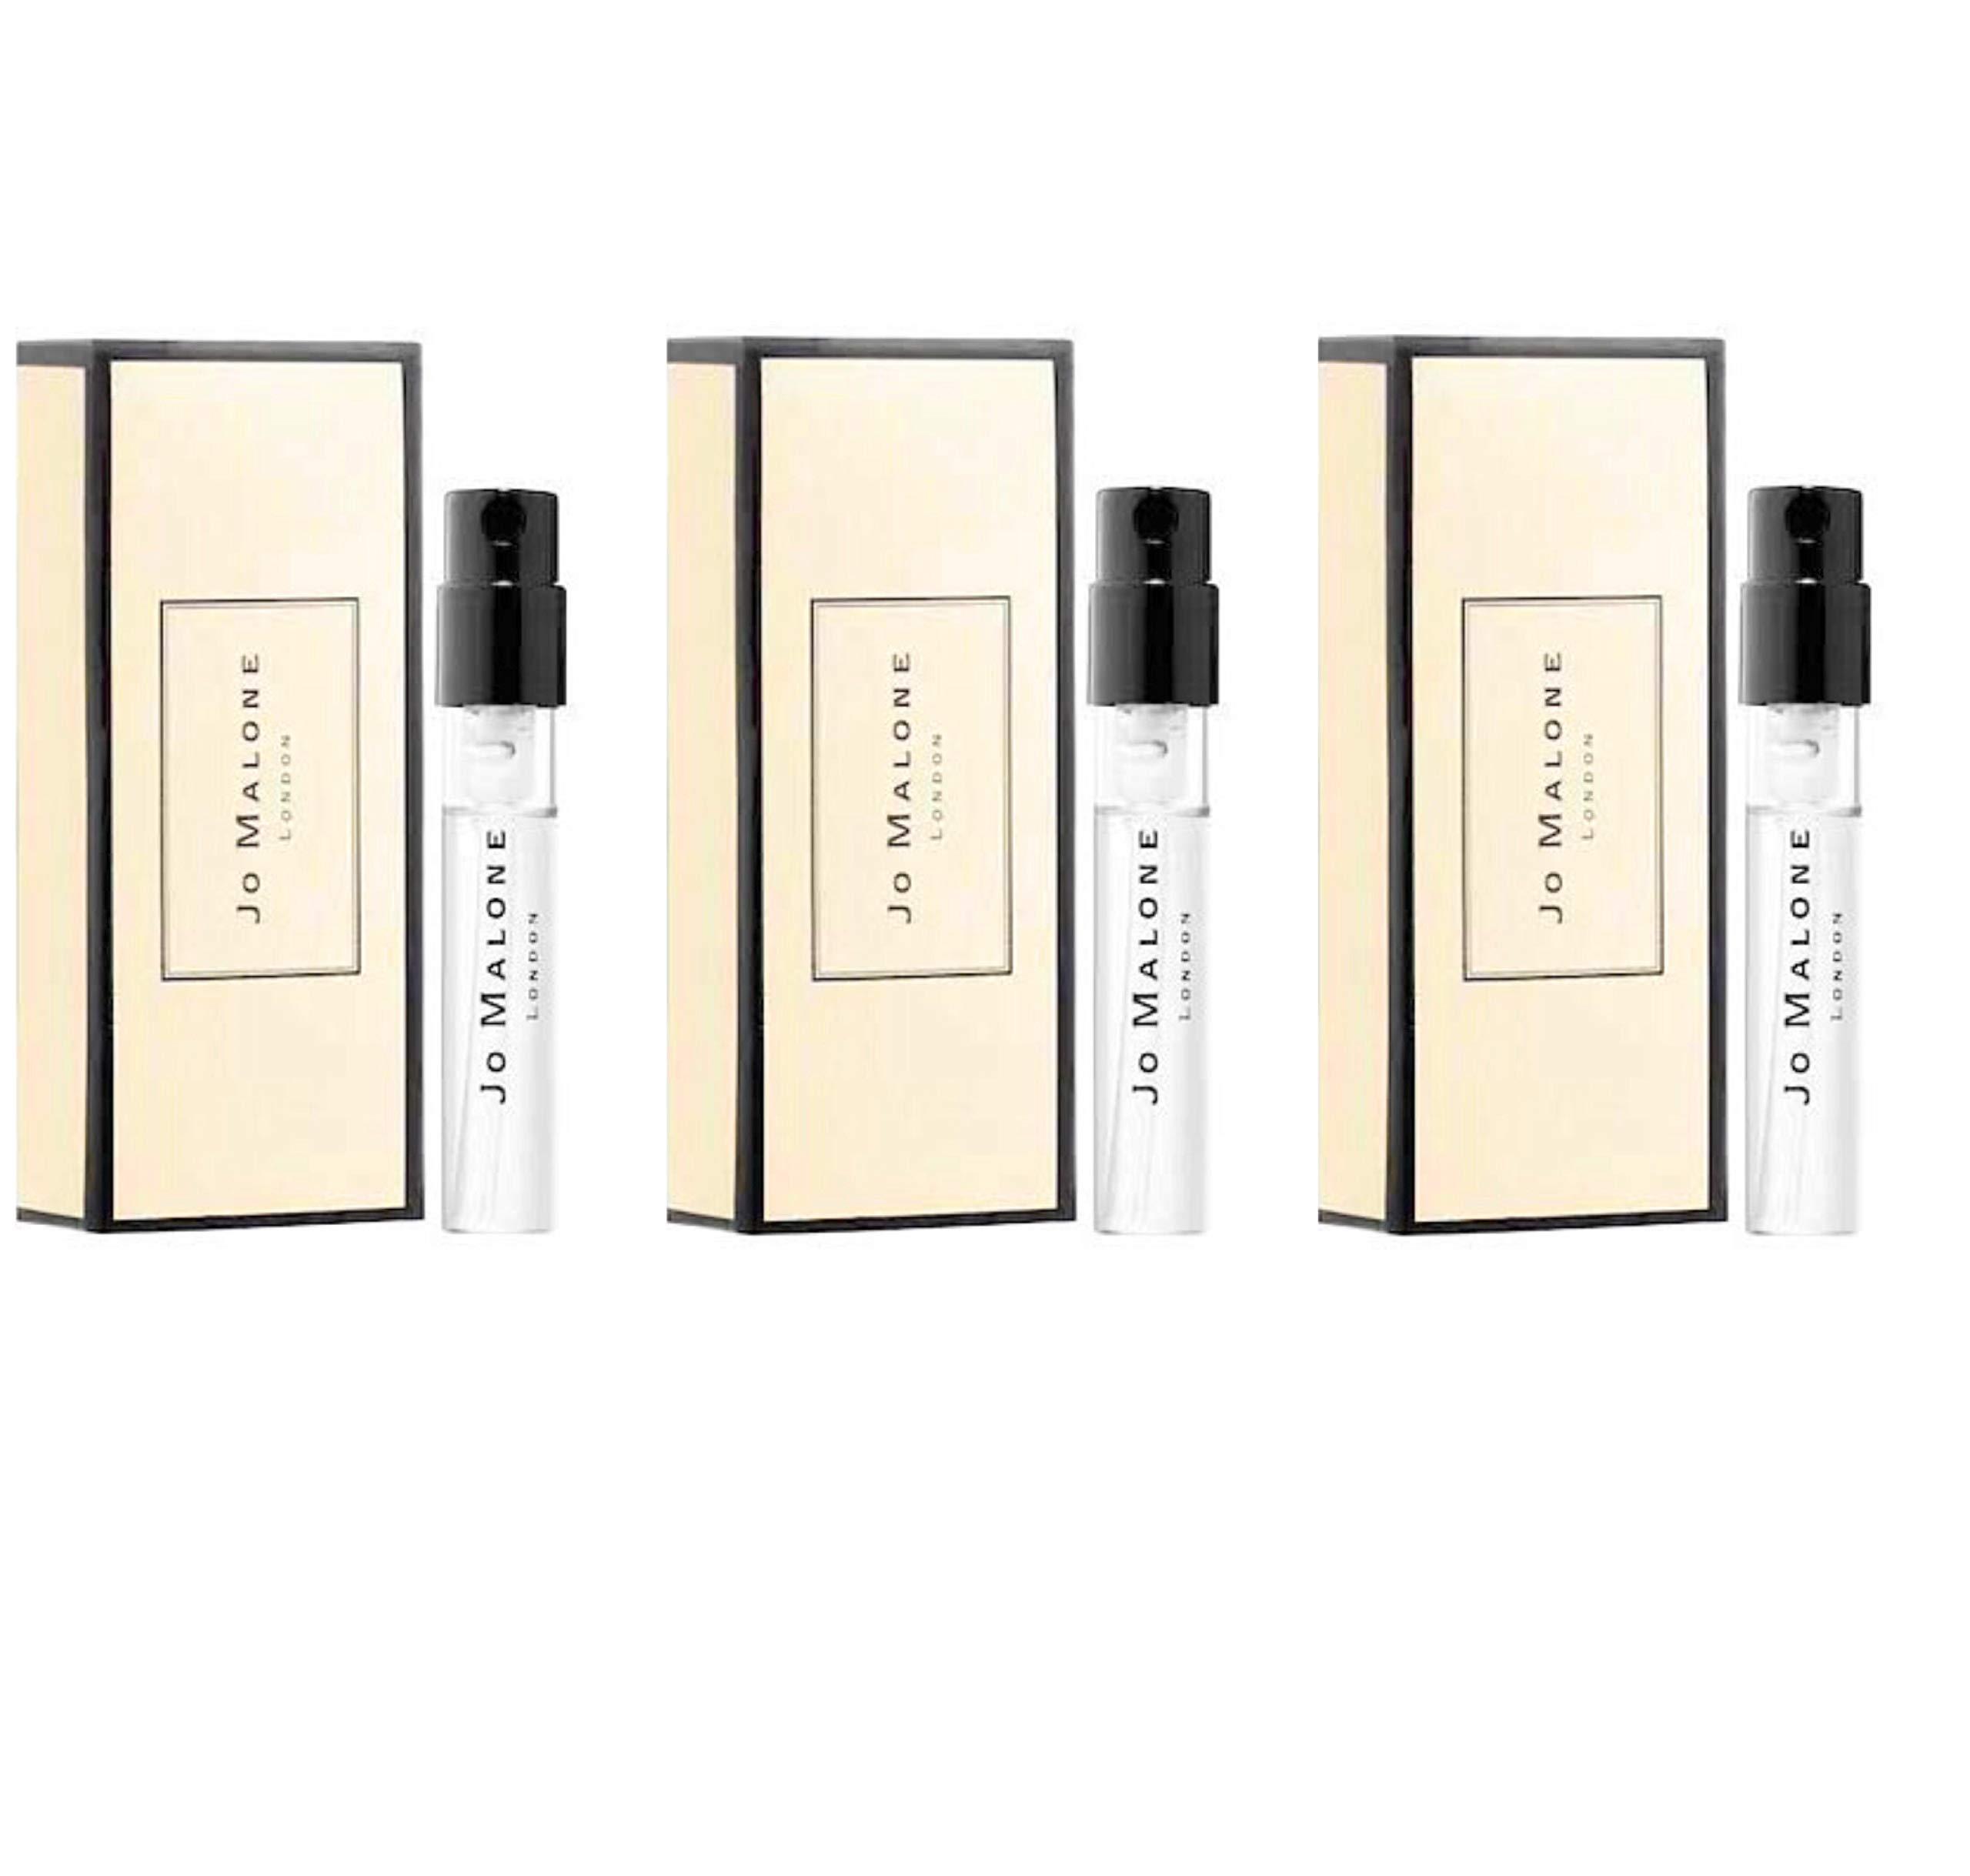 Jo Malone London Wood Sage & Sea Salt Cologne ~ Sample Set of 3 ~ 0.05 fl each/ total 0.15 fl oz